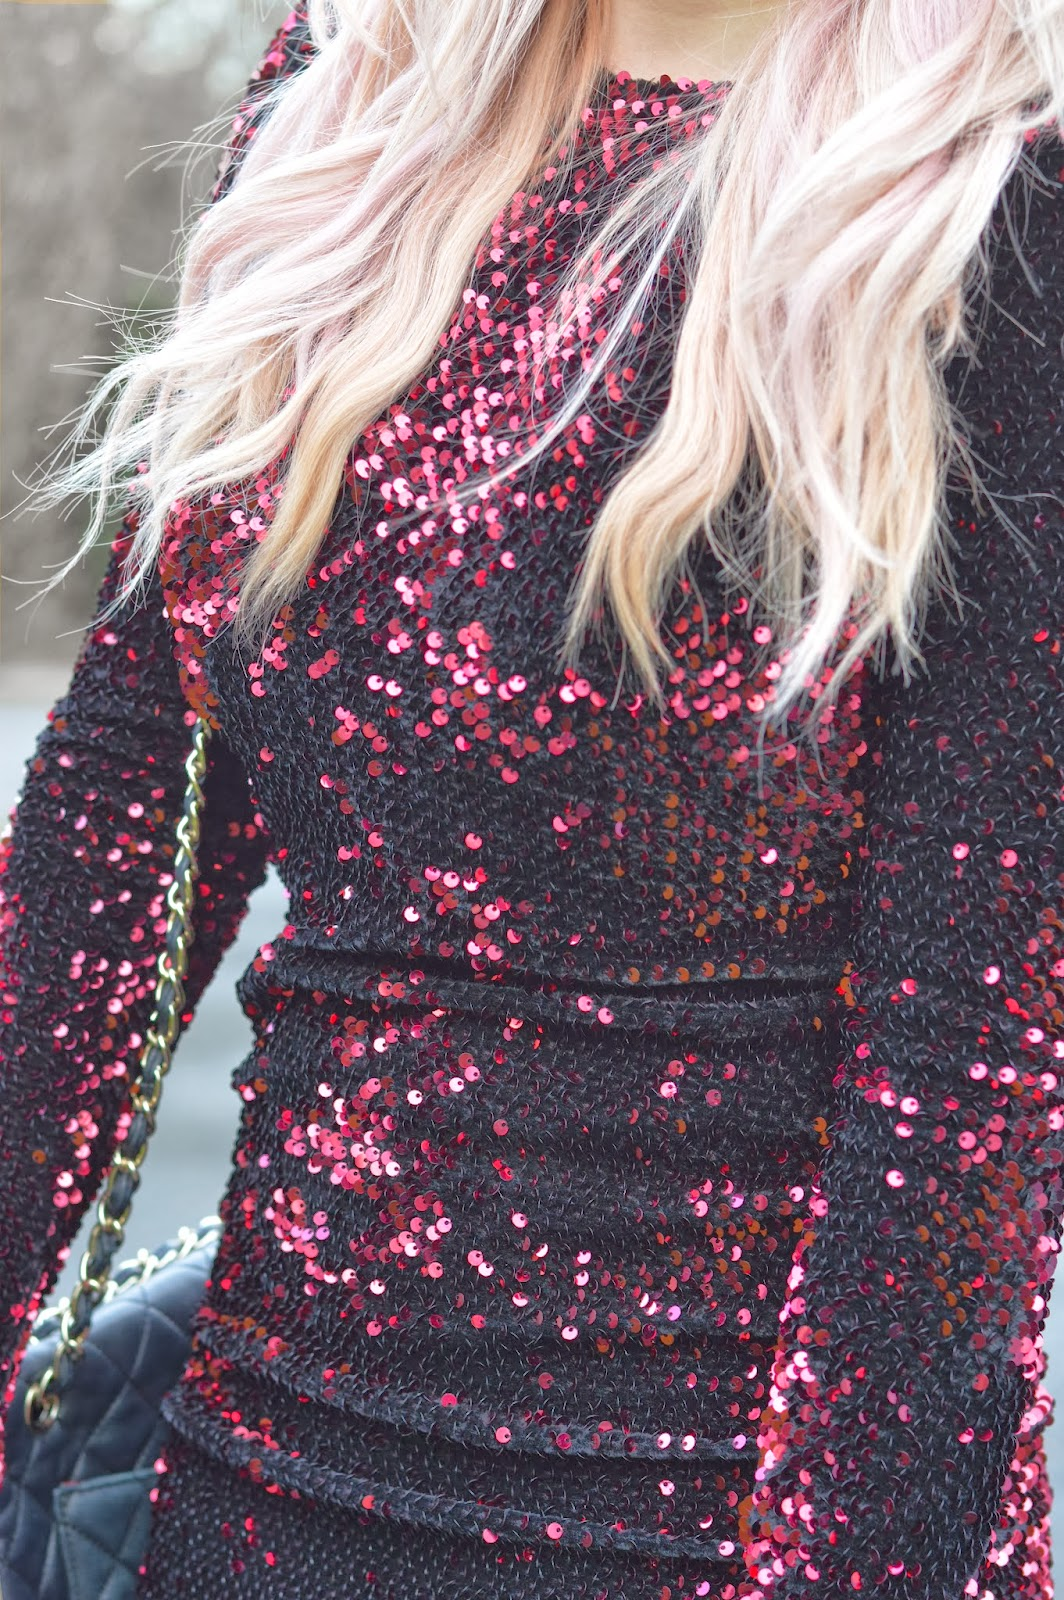 Sammi Jackson - Valentine's Day Outfit